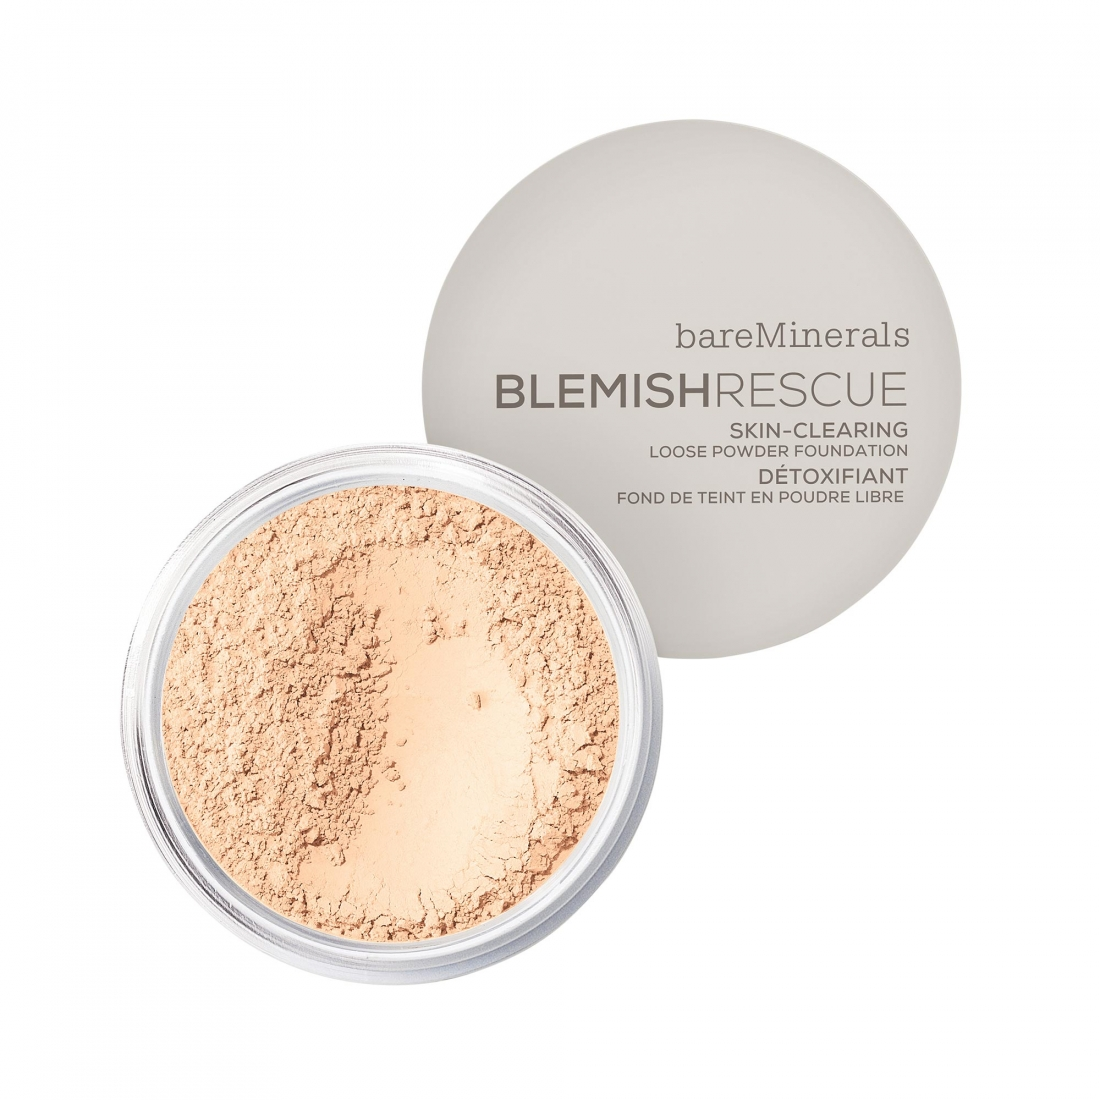 BareMinerals Blemish Rescue Skin Clearing Powder Foundation